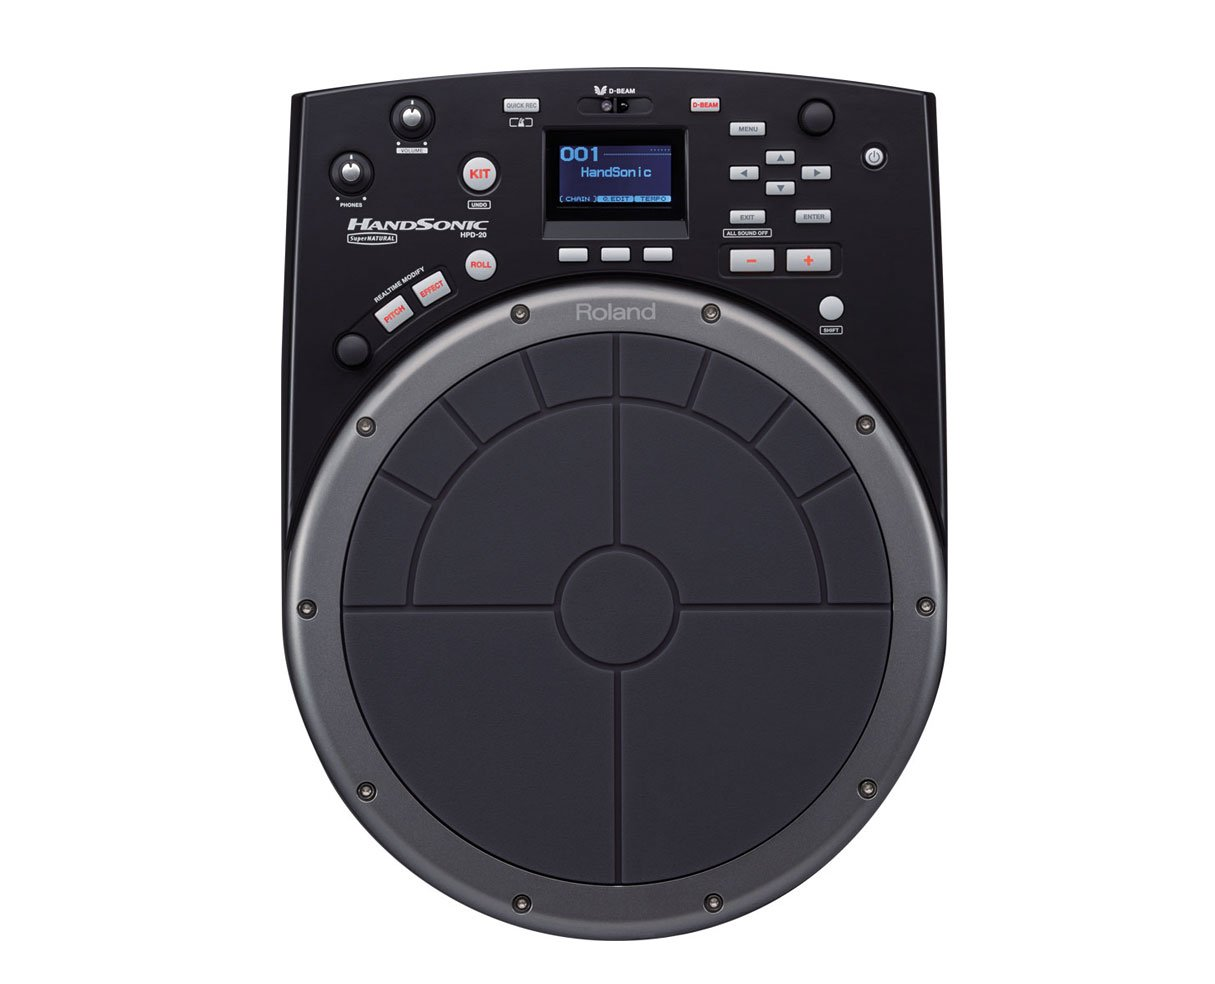 Roland HandSonic HPD-20 Digital Hand Percussion Controller - Black